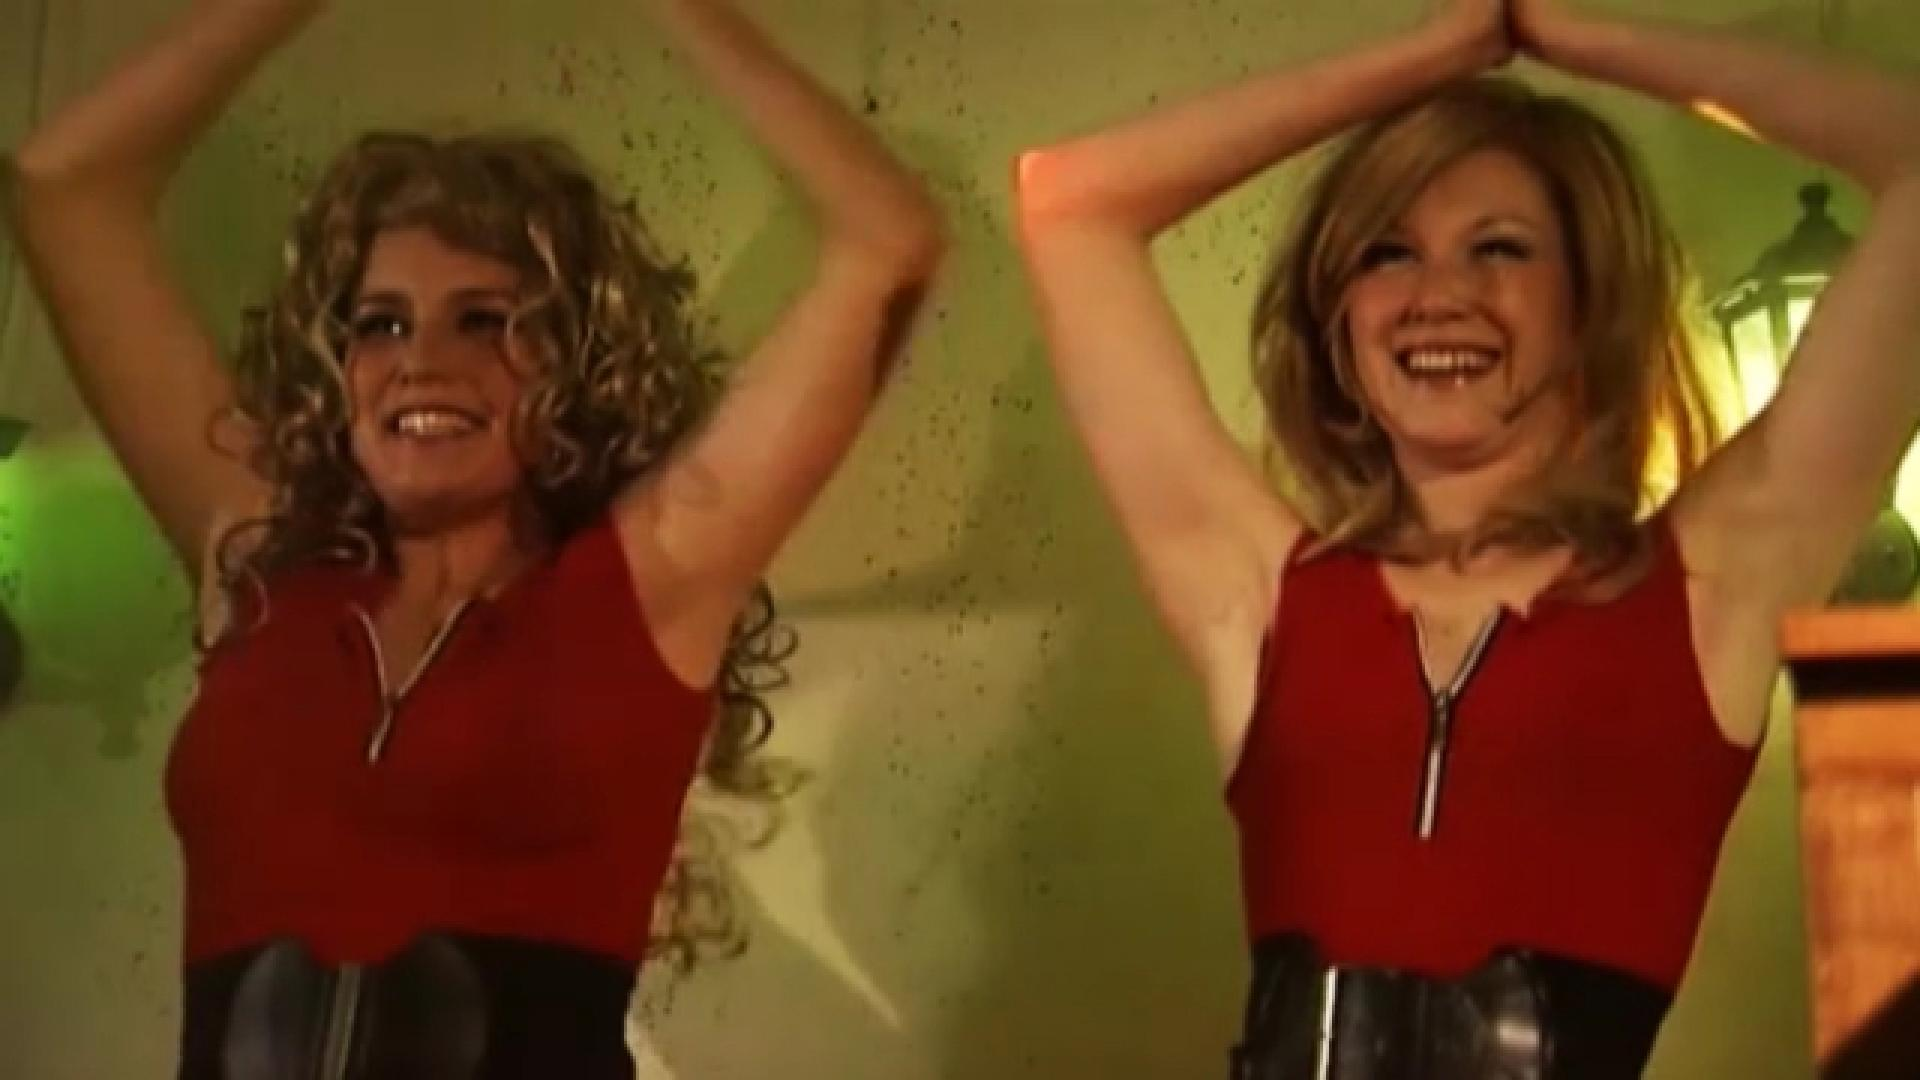 Argentiinan homo porno tähti